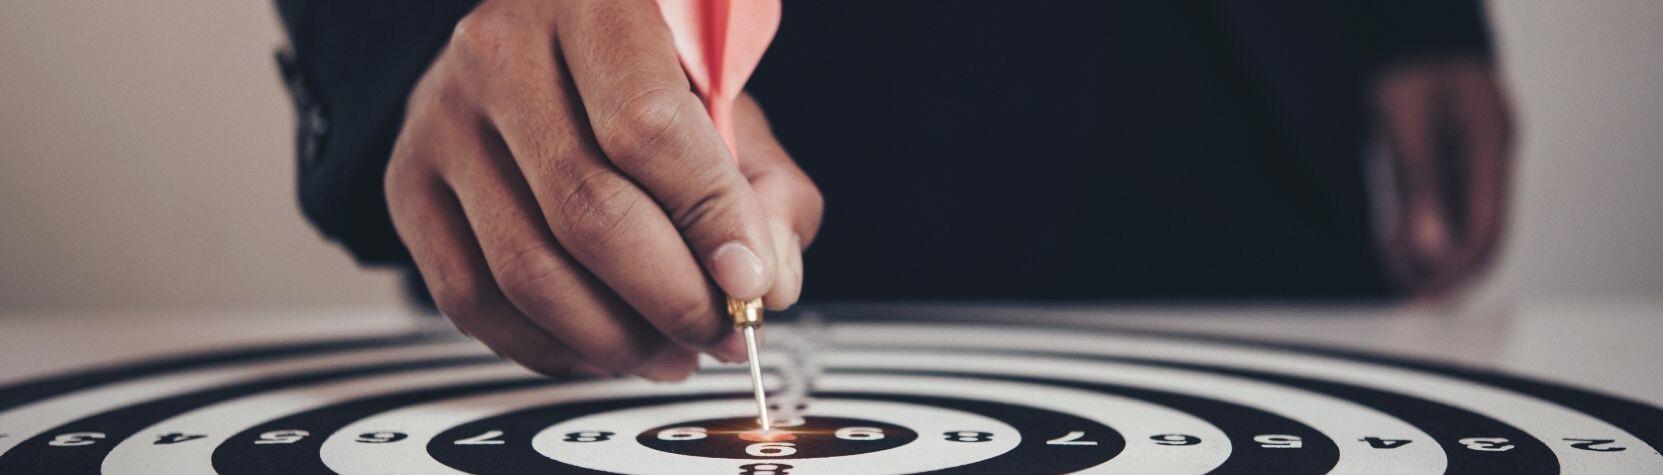 Vds training consultants blog purpose als nieuwe definitie van succes